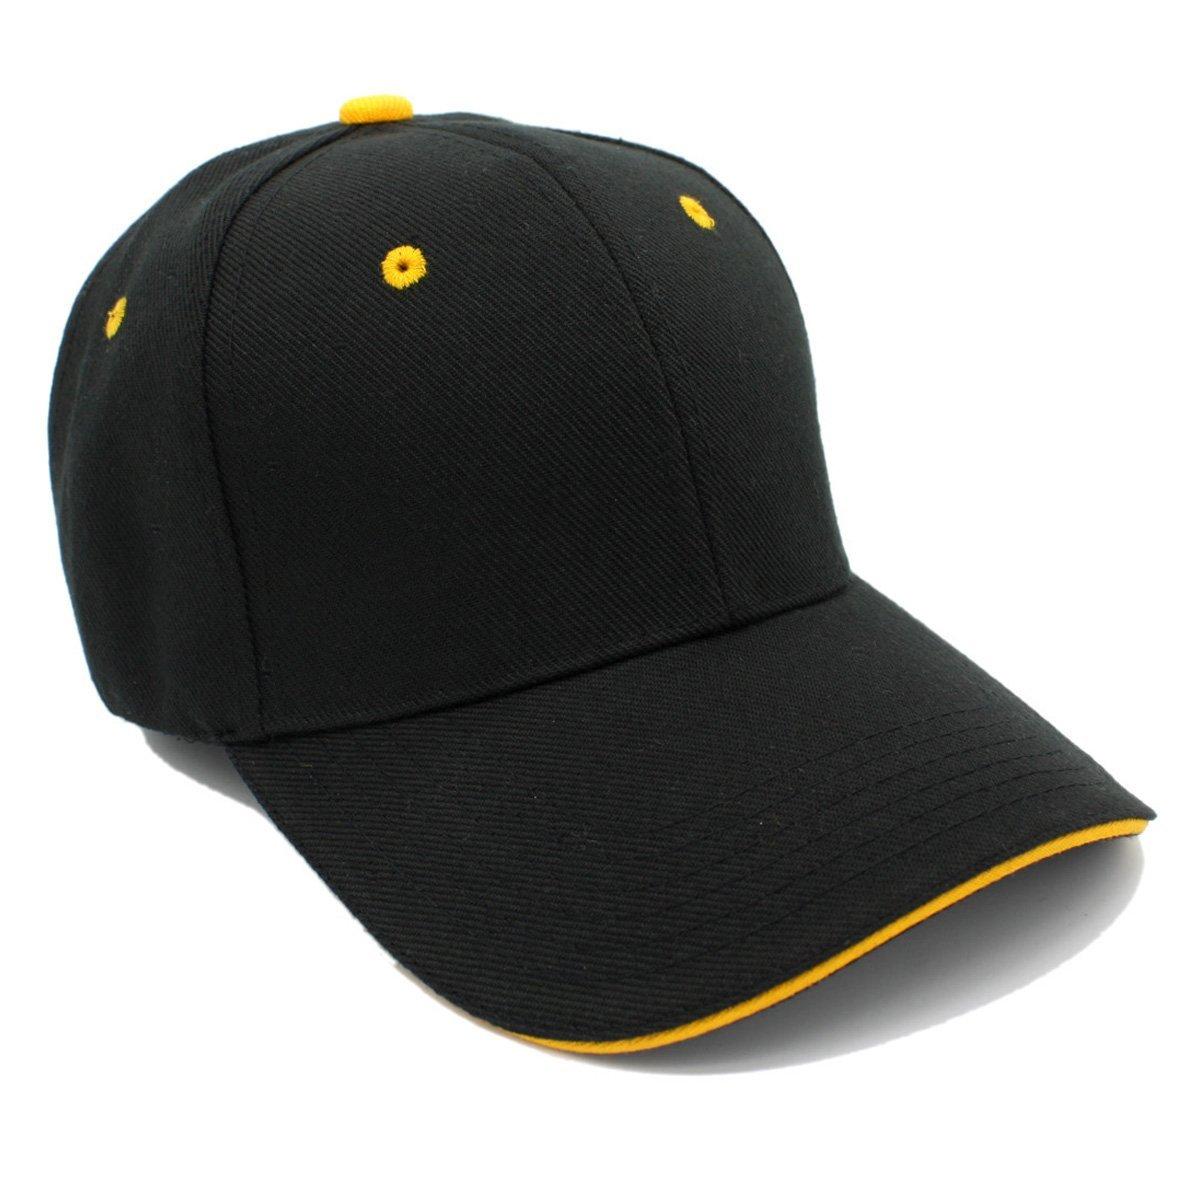 4f0f83ae5b8 Plain Baseball Cap Color Eyelet Adjustable Velcro Strap Hat for ...